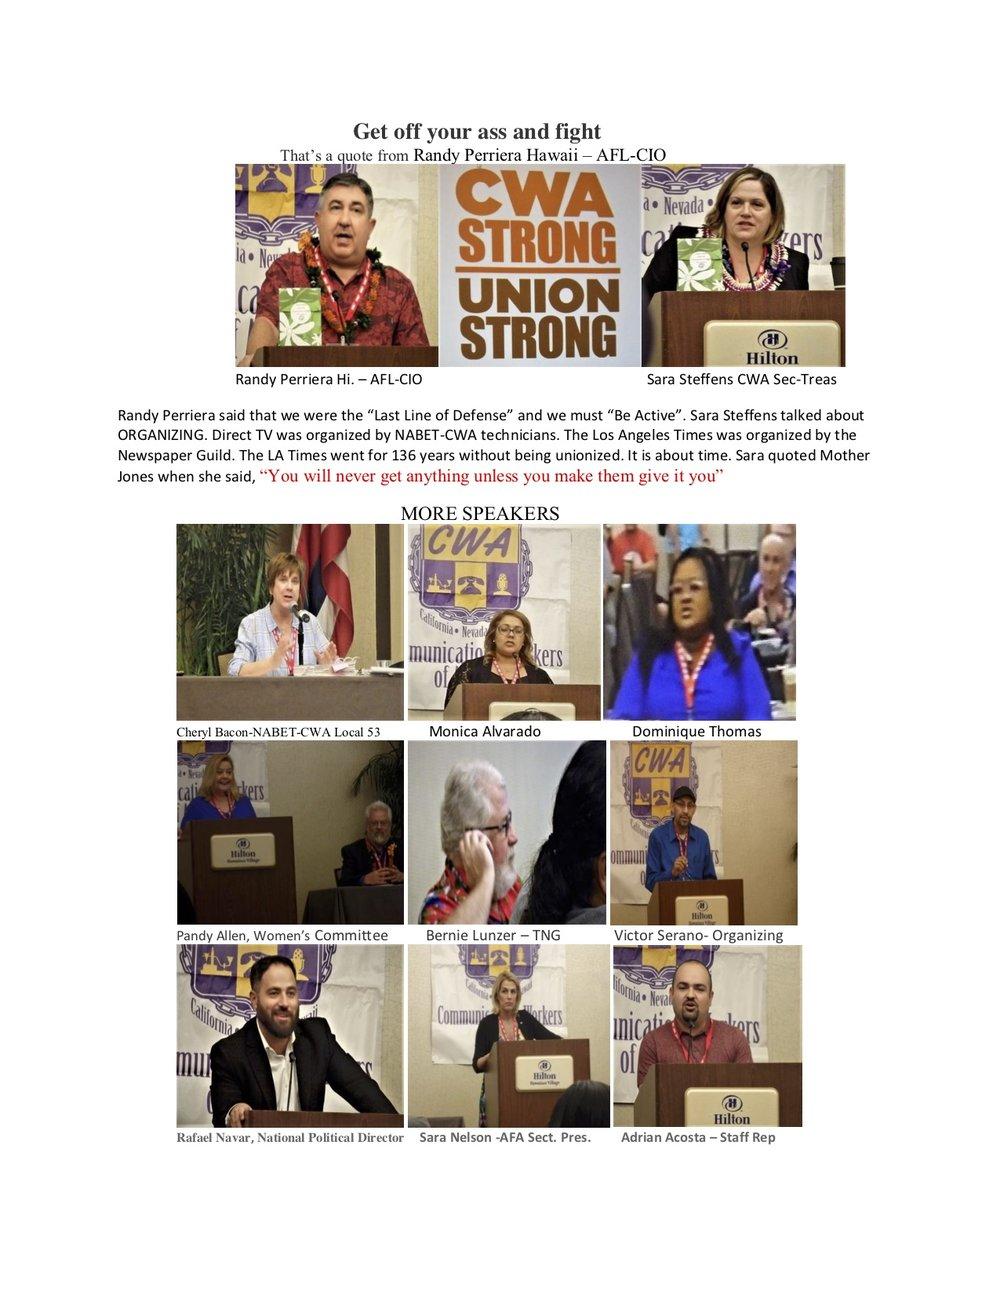 2018-CWA-District-9-Leadership-Conference-Honolulu-HI-3.jpg